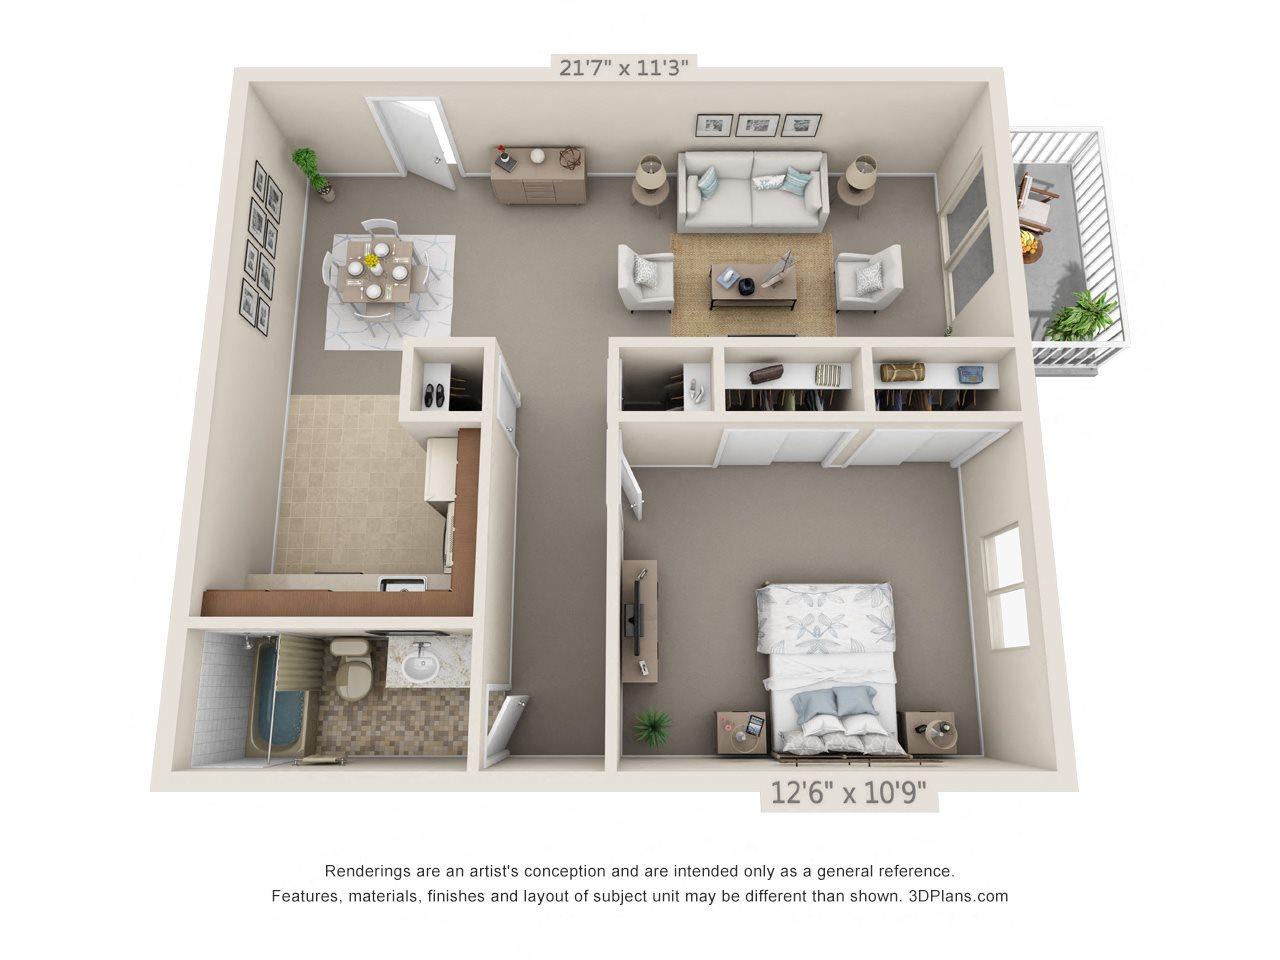 1 Bedroom, 1 Bath (Patio, Heat Paid) Floor Plan 5